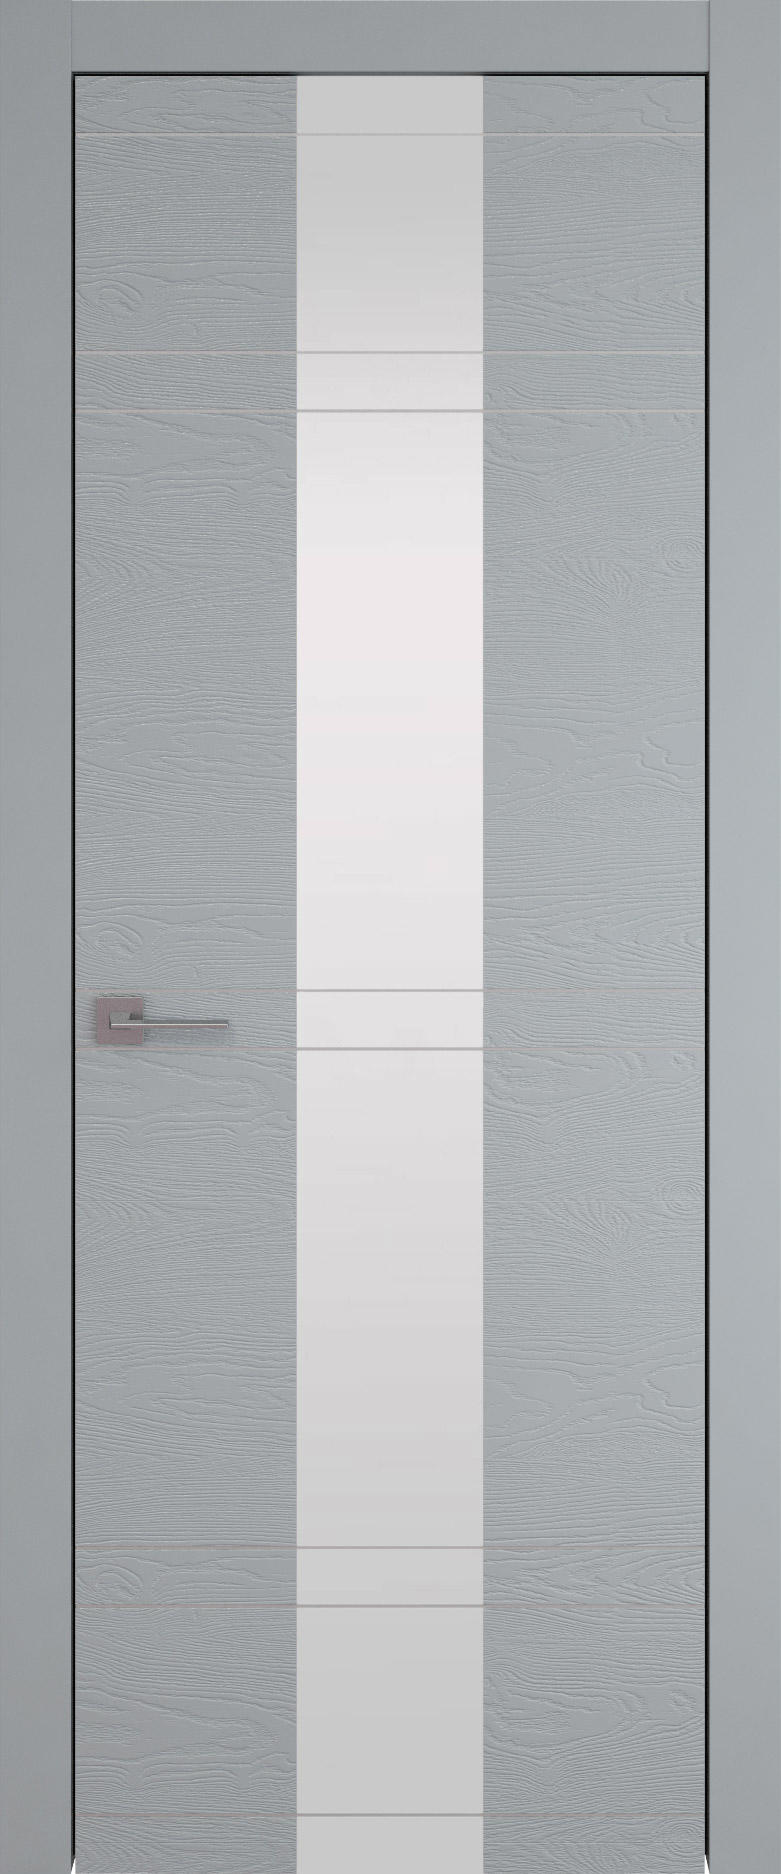 Tivoli Ж-4 цвет - Серебристо-серая эмаль по шпону (RAL 7045) Со стеклом (ДО)